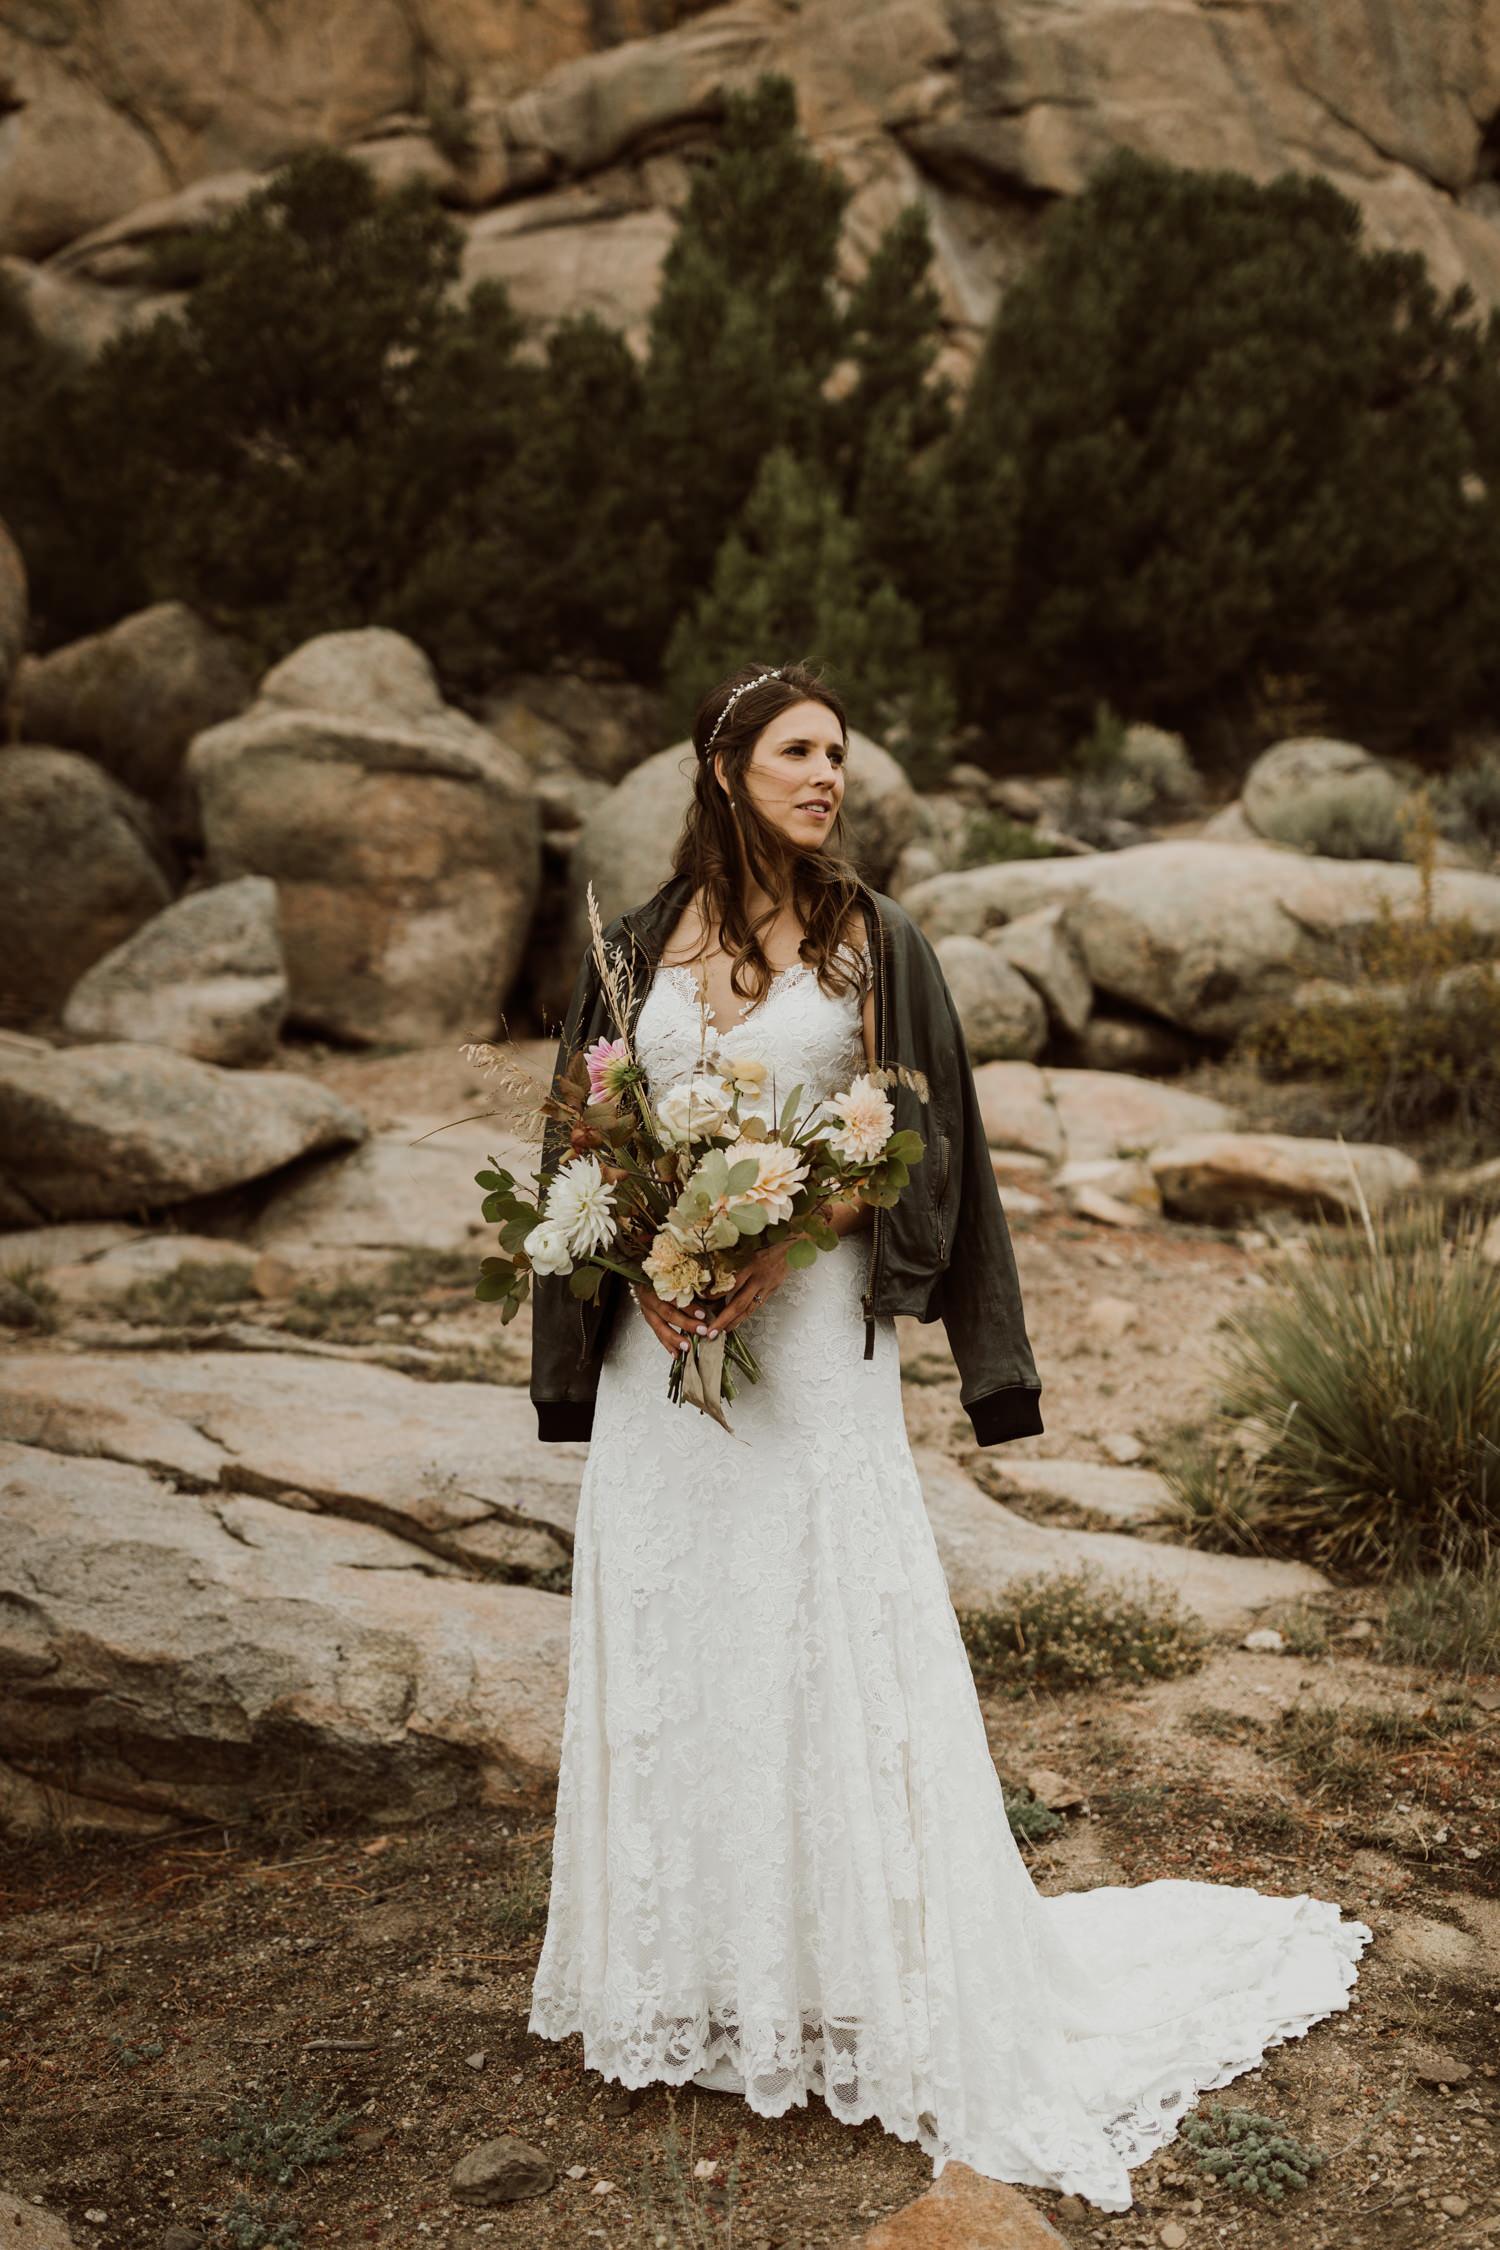 17-9-adventure-wedding-photographer-26.jpg